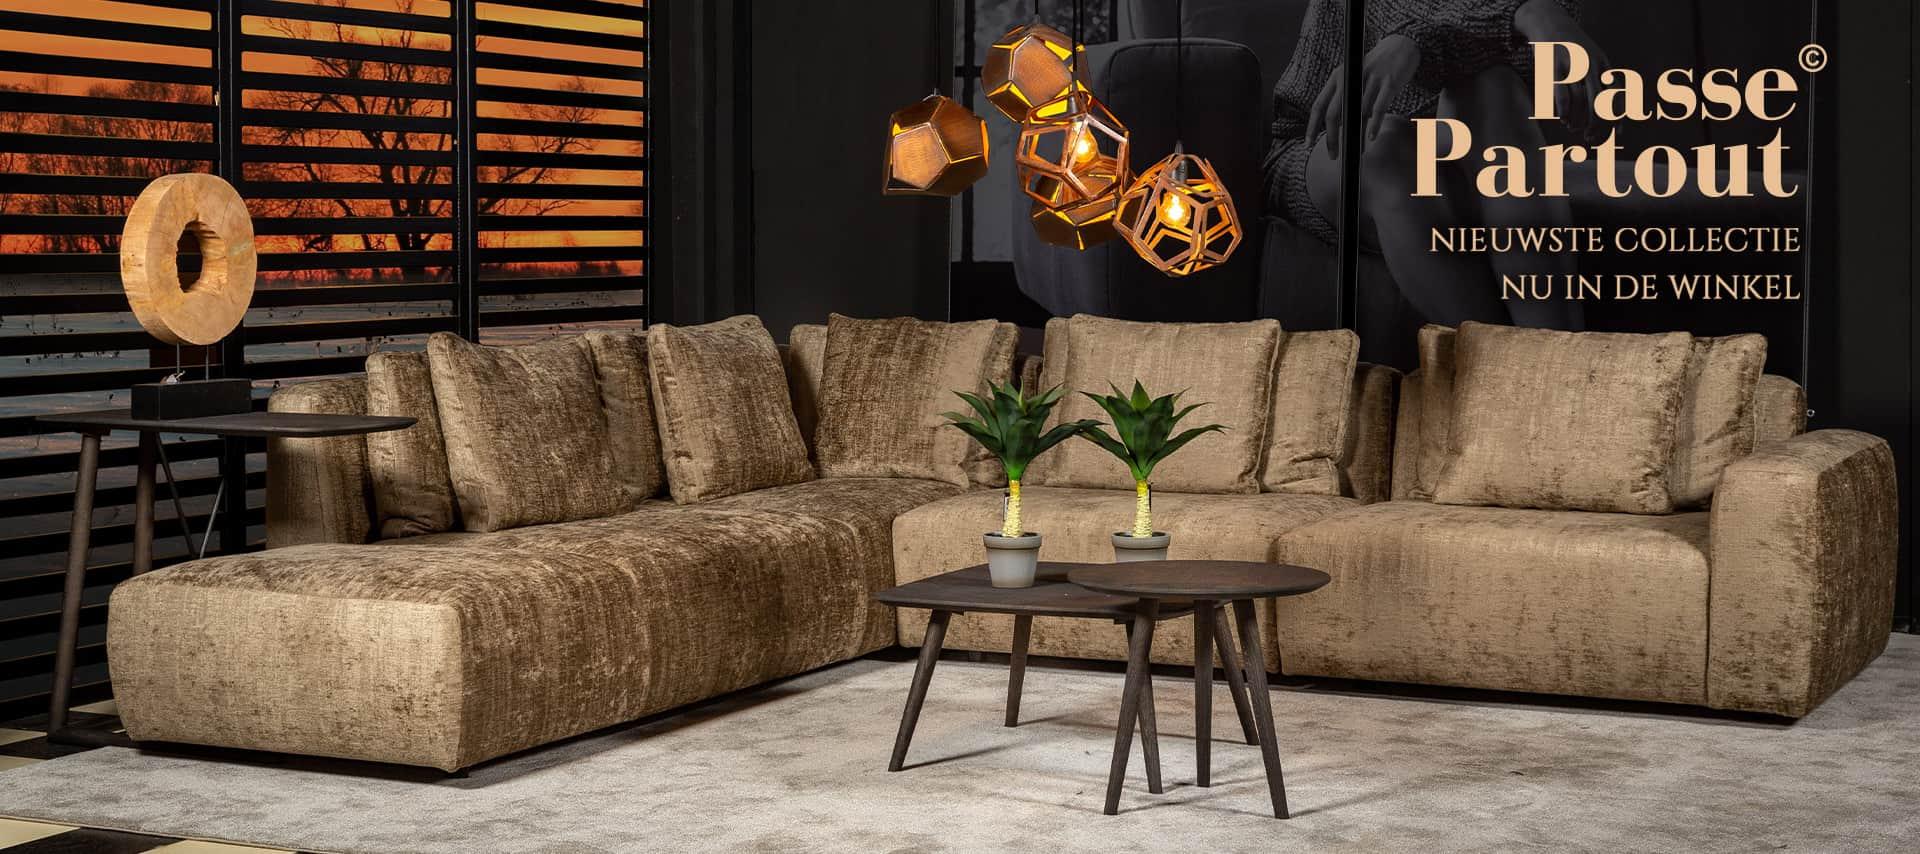 Fantastic Country Lifestyle Specialist In Landelijk Wonen Bralicious Painted Fabric Chair Ideas Braliciousco